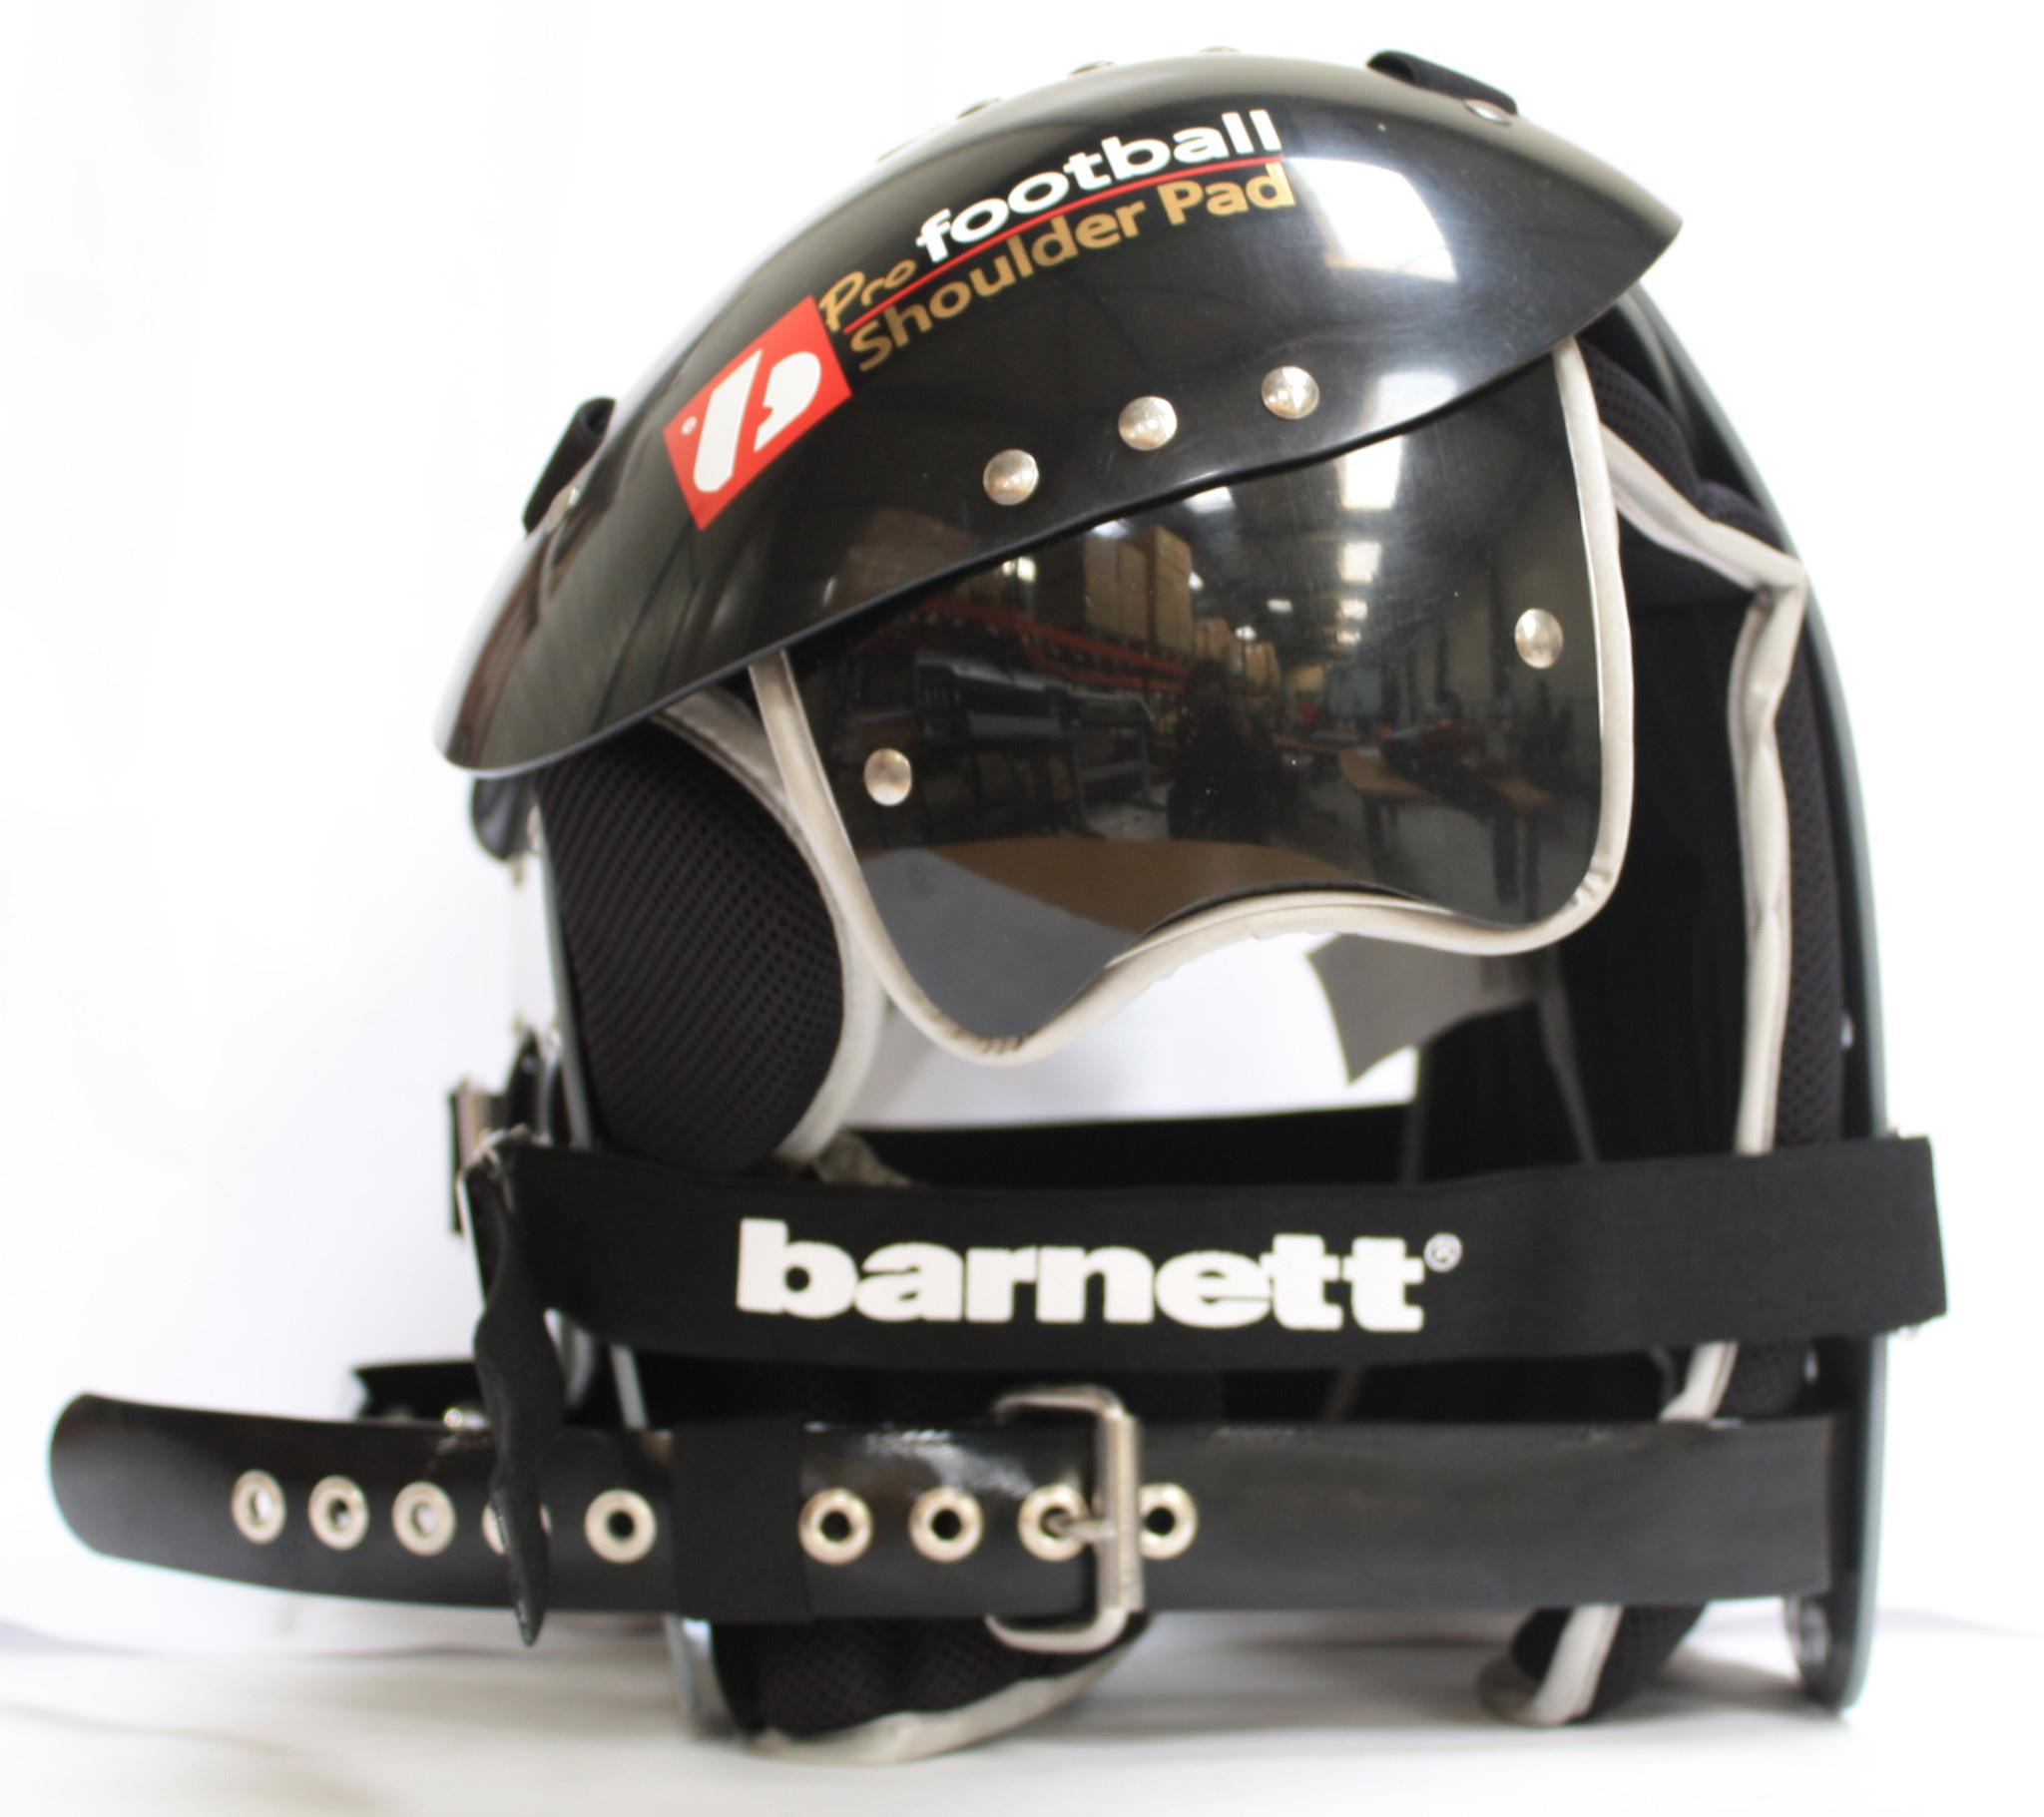 Z-430 III Elite light football shoulder pad, black